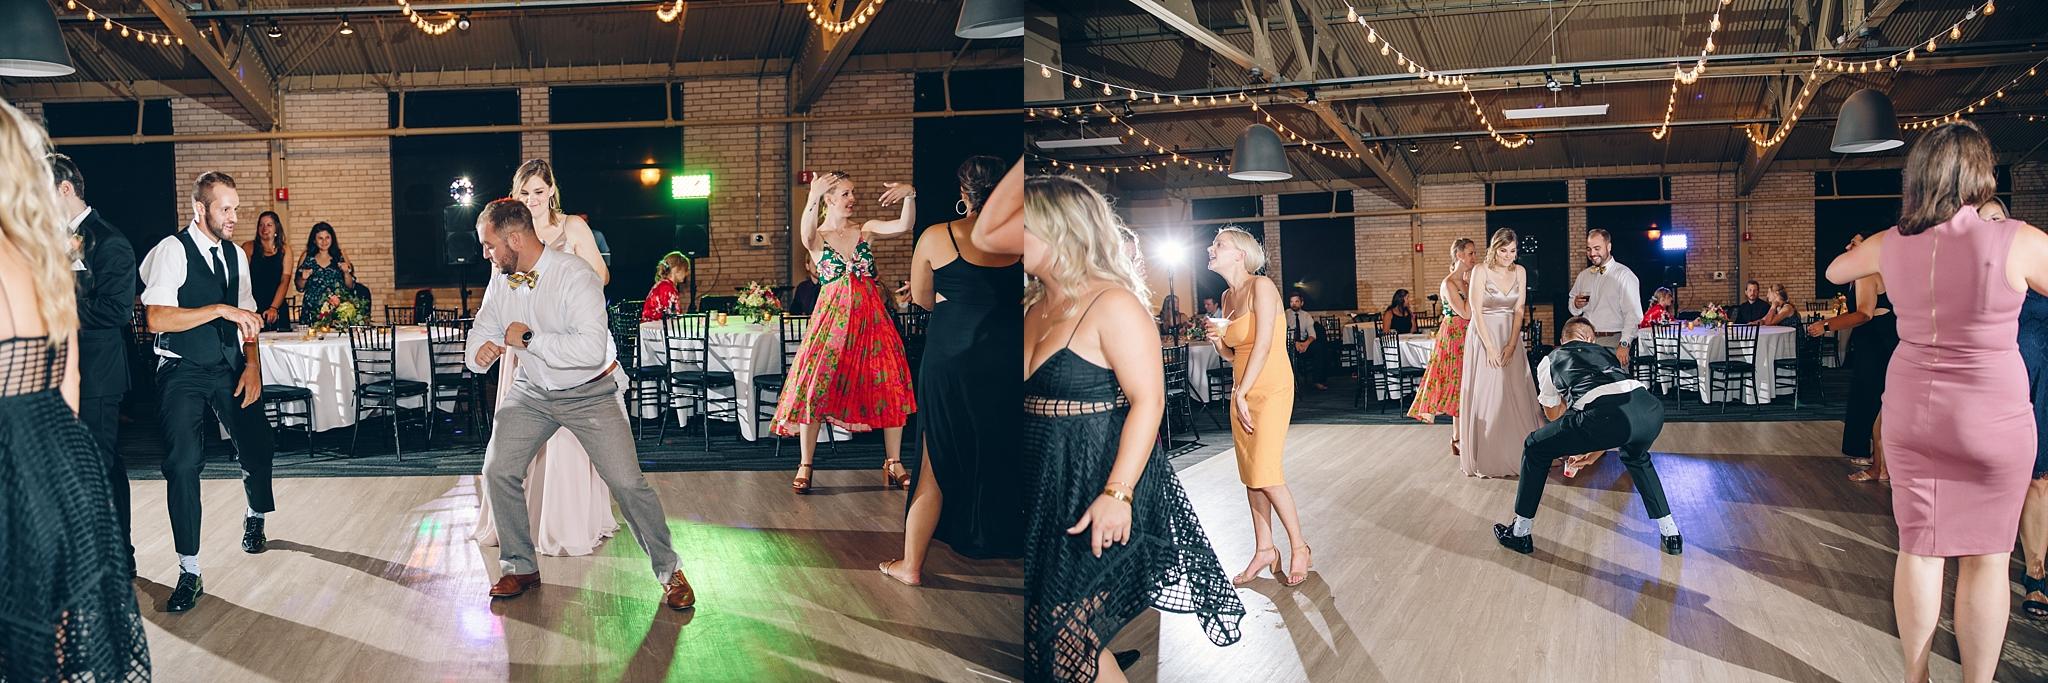 baker-lofts-holland-michigan-wedding-photographer_0411.jpg